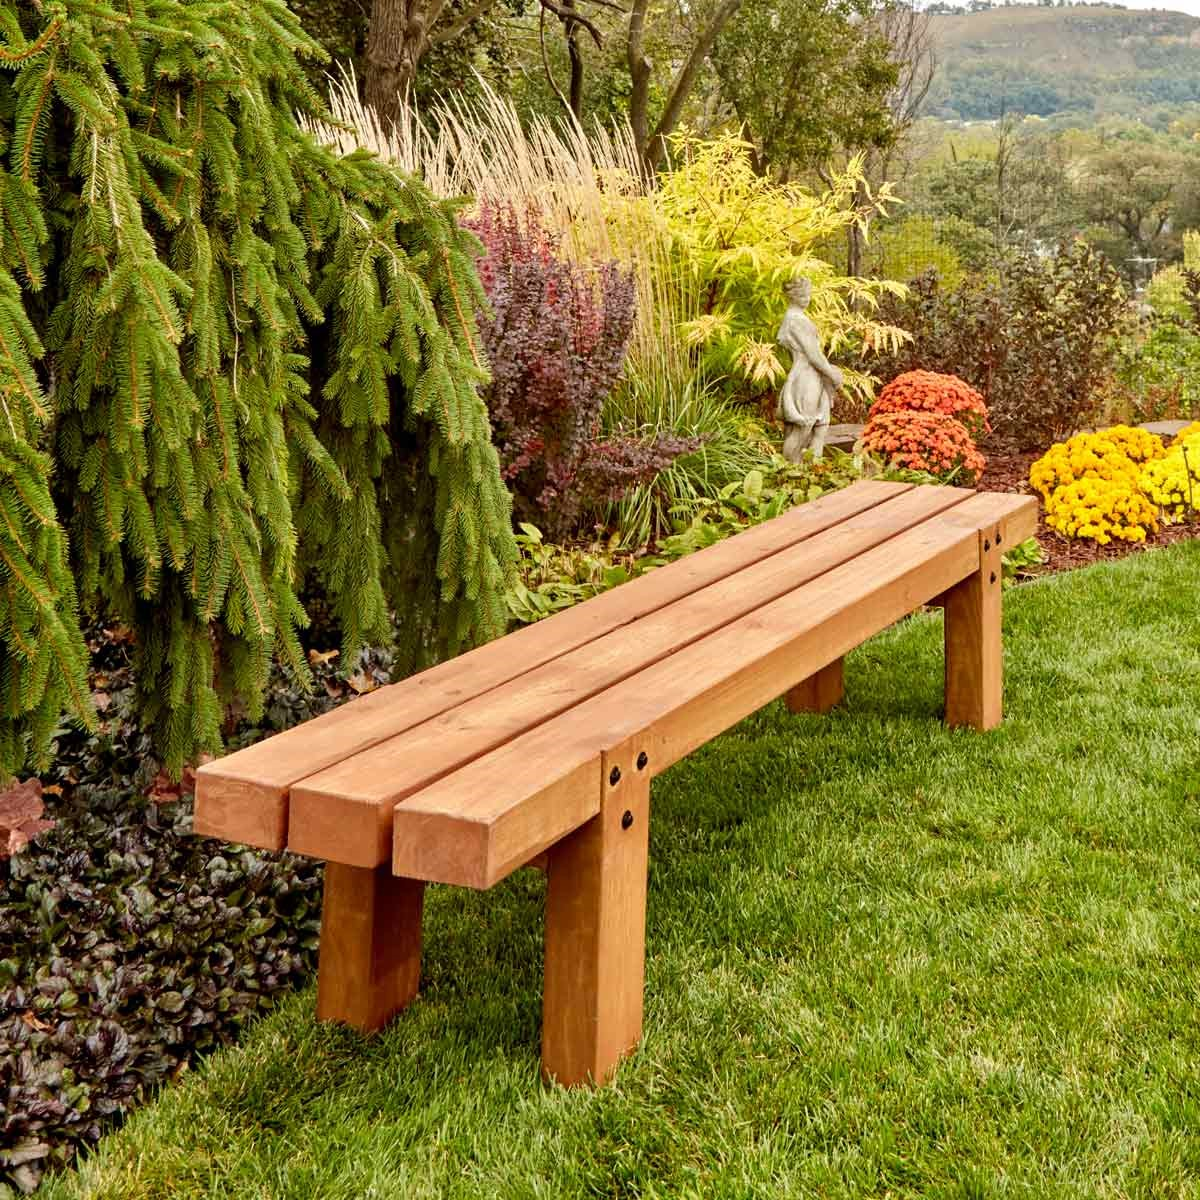 10.SIMPHOME.COM 10 DIY Outdoor Wood Projects Simple Garden Bench